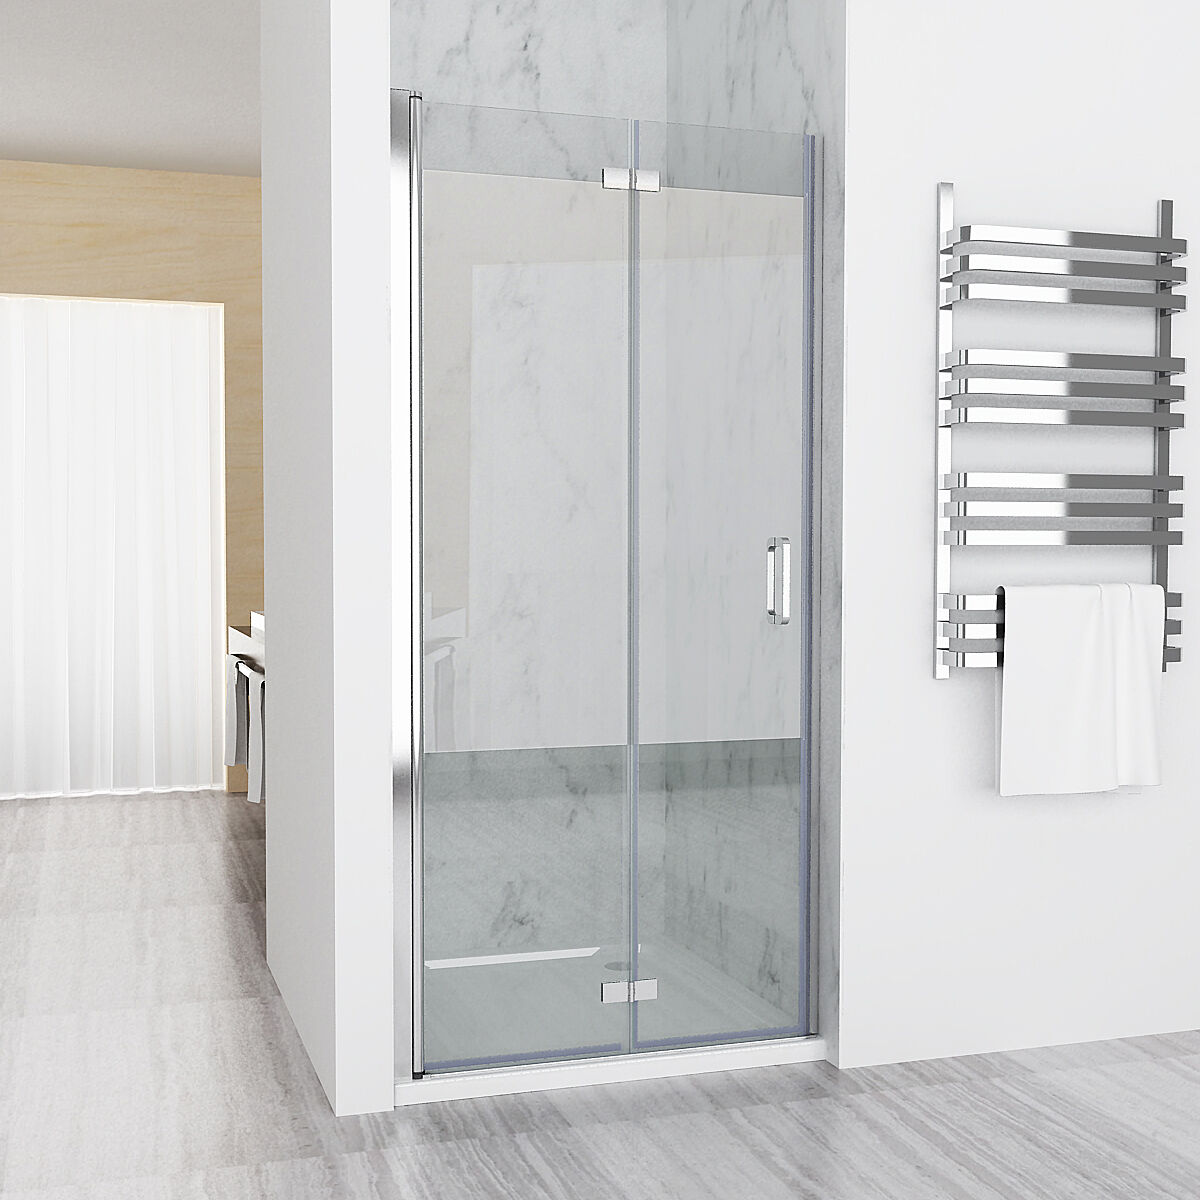 nischent r duschabtrennung duschwand dusche 180 faltt r nano esg 80 x 185 cm ebay. Black Bedroom Furniture Sets. Home Design Ideas